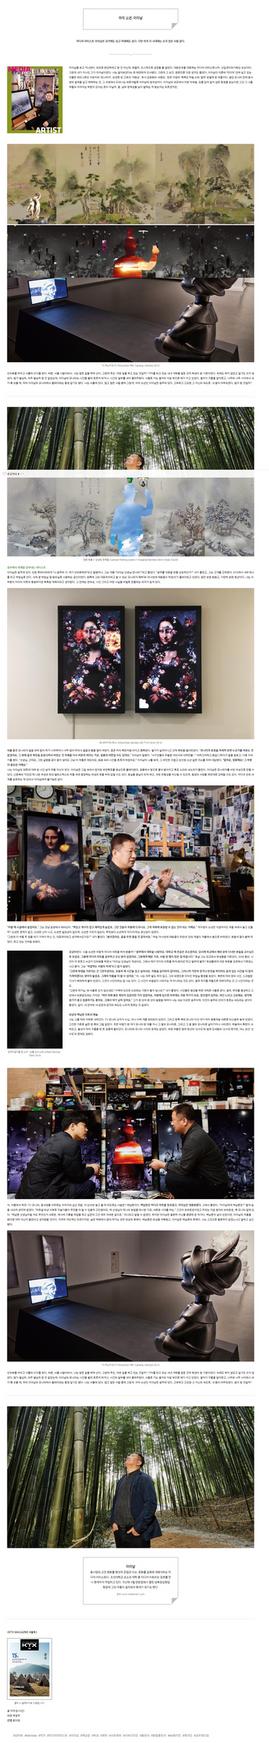 [KTX매거진 / INTERVIEW]뒤샹 그리고 백남준을 이어가는 작가, 미디어 아티스트 이이남